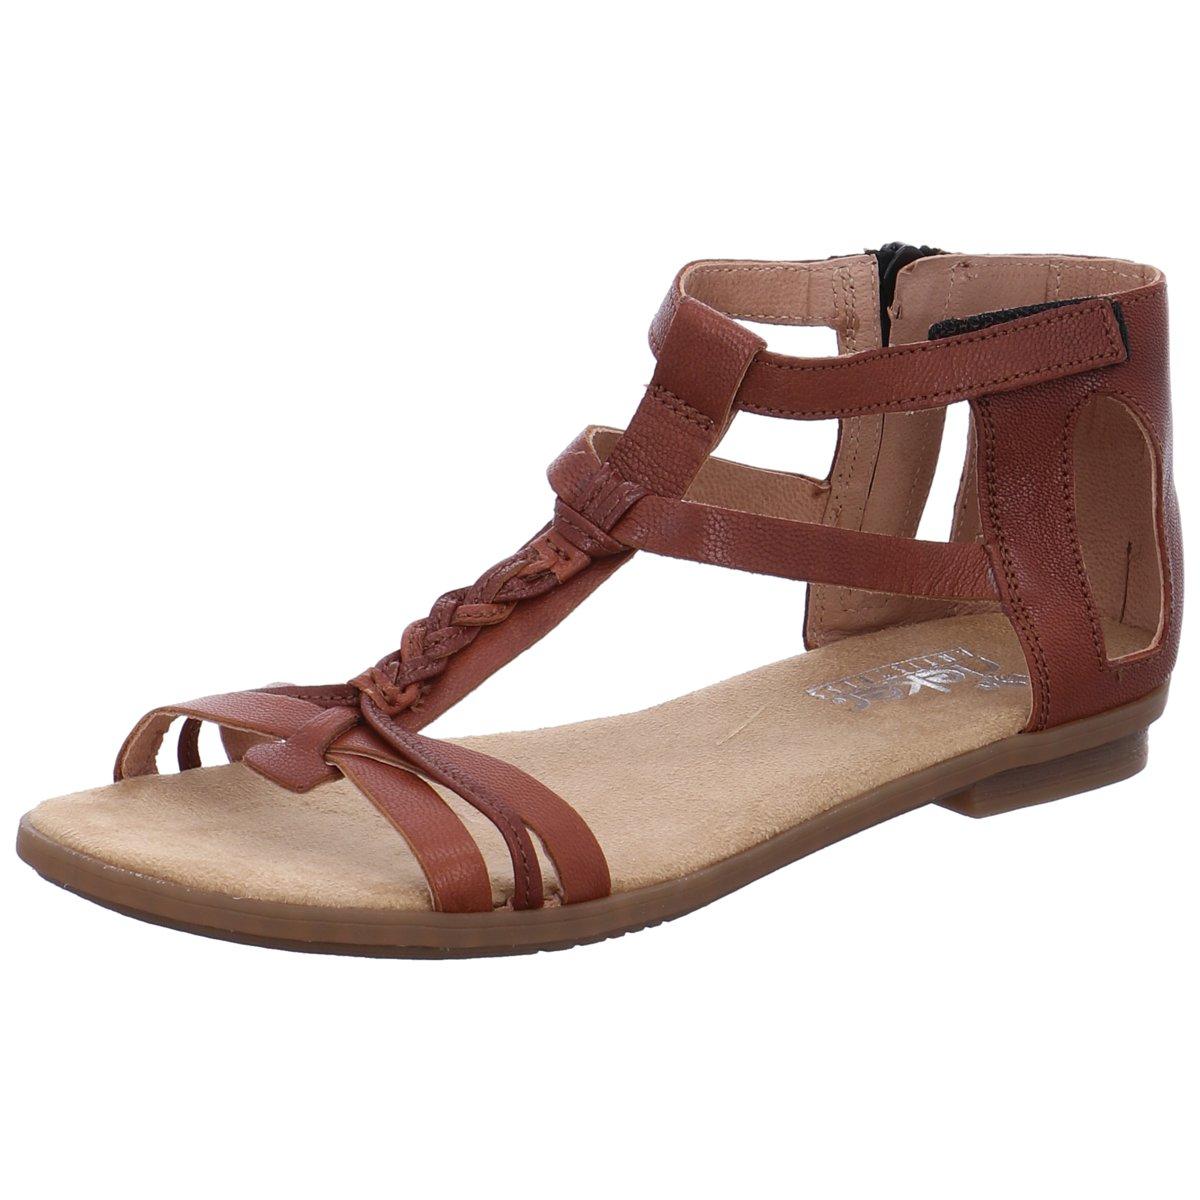 Rieker Damen Sandaletten 64225 24 braun 627509 | eBay n3LLN